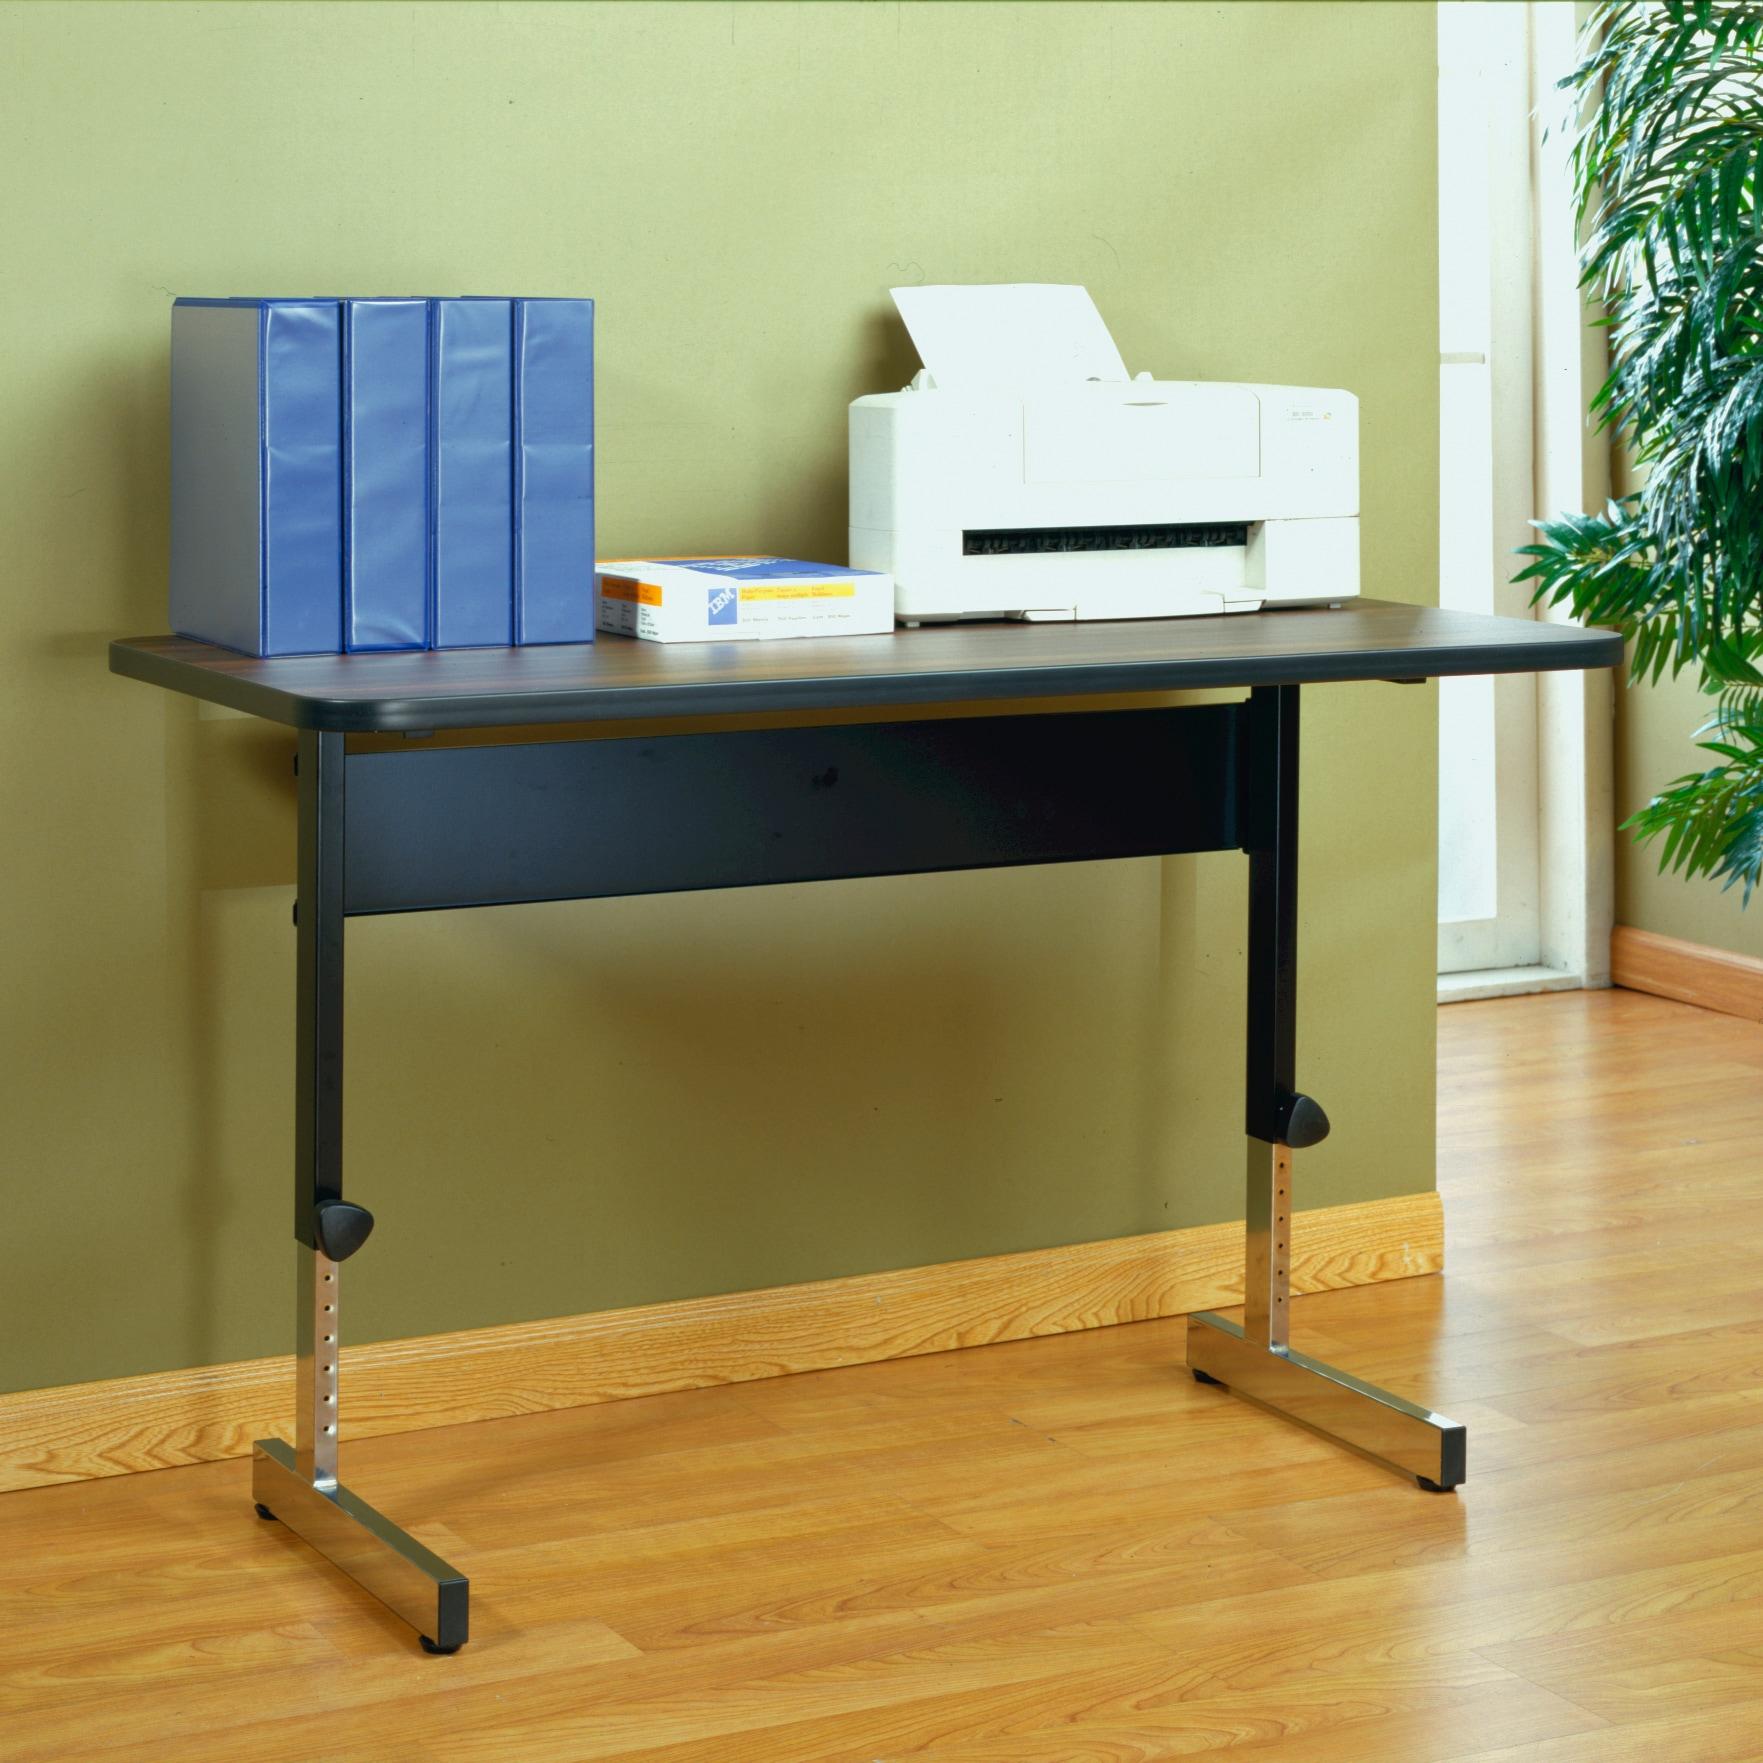 calico designs black walnut adapta 48 inch desk overstock shopping